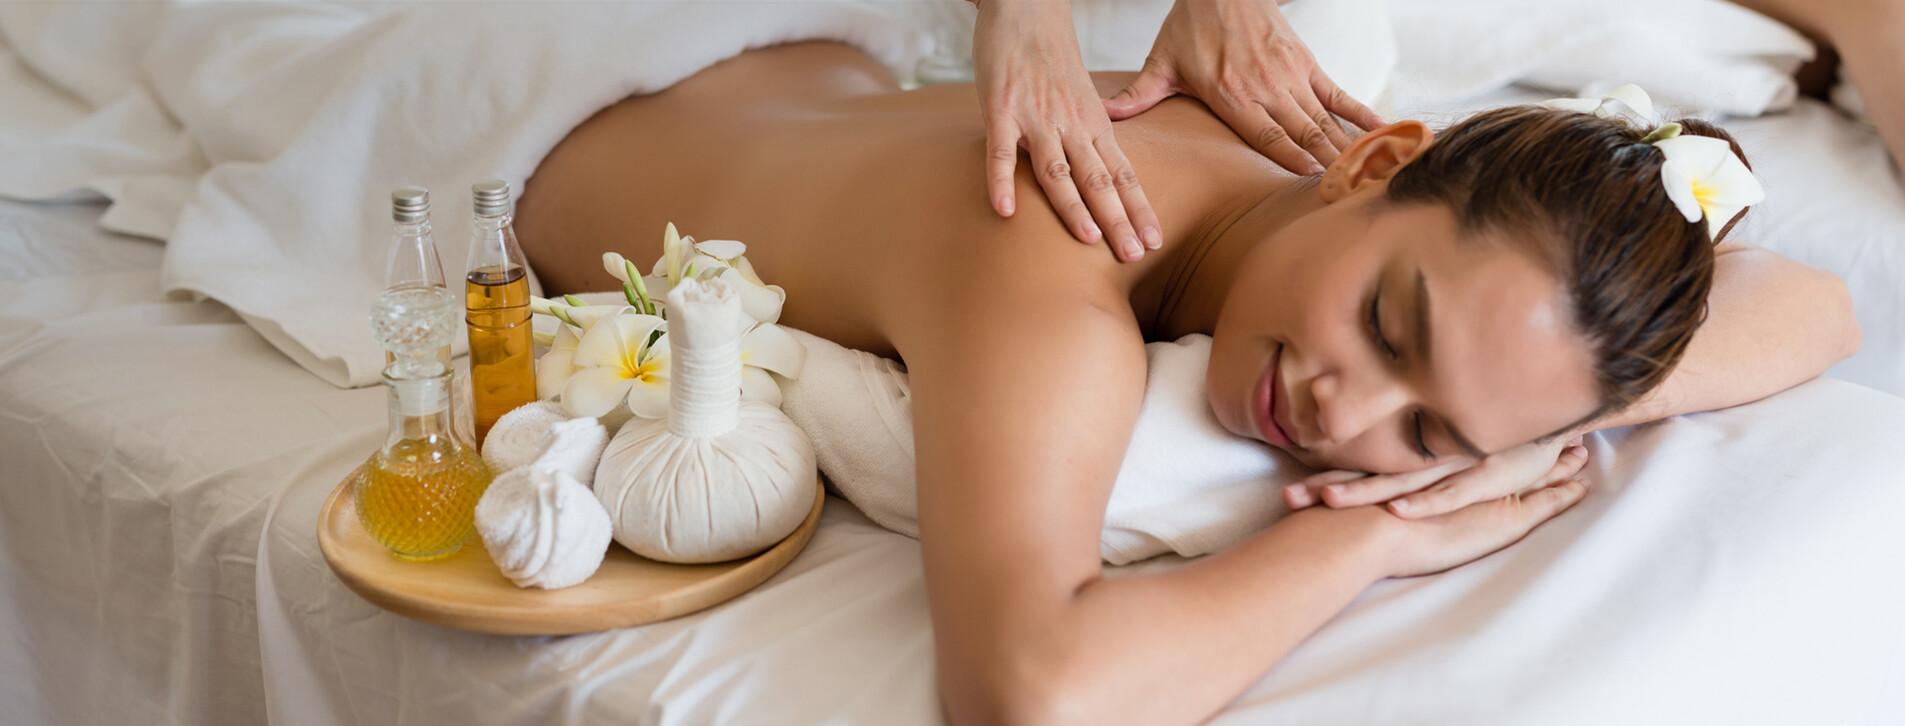 Фото 1 - Oil-массаж